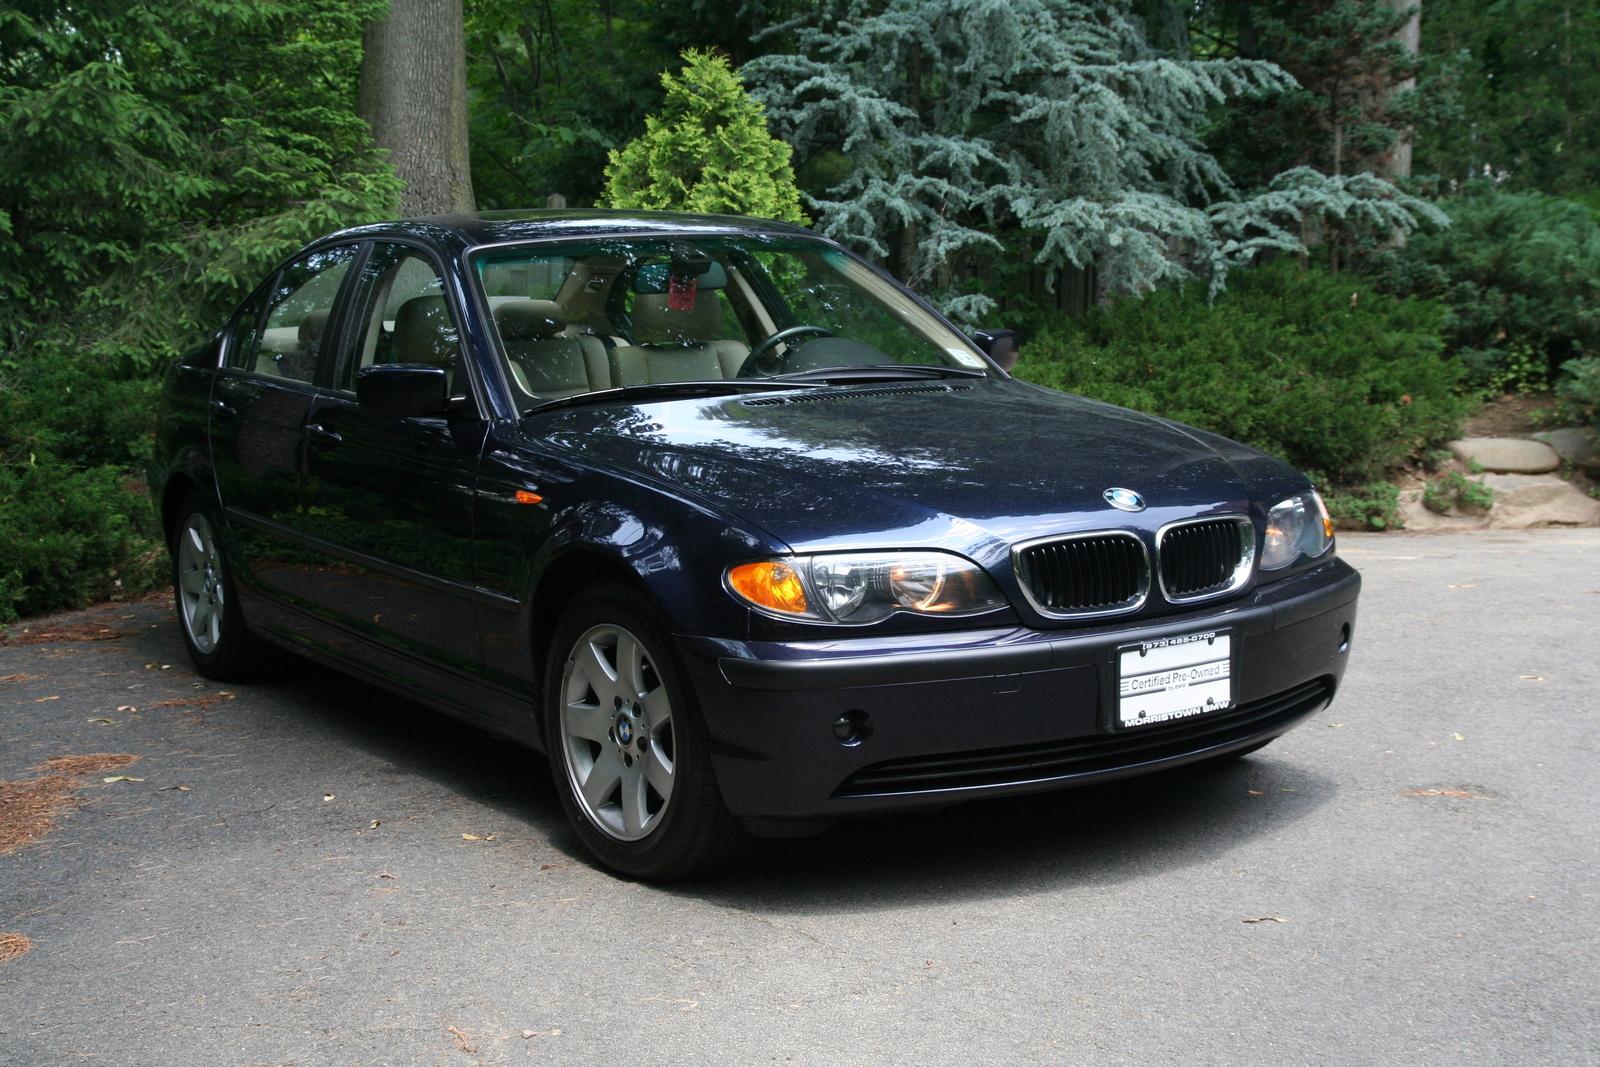 BMW 3 series (2005)